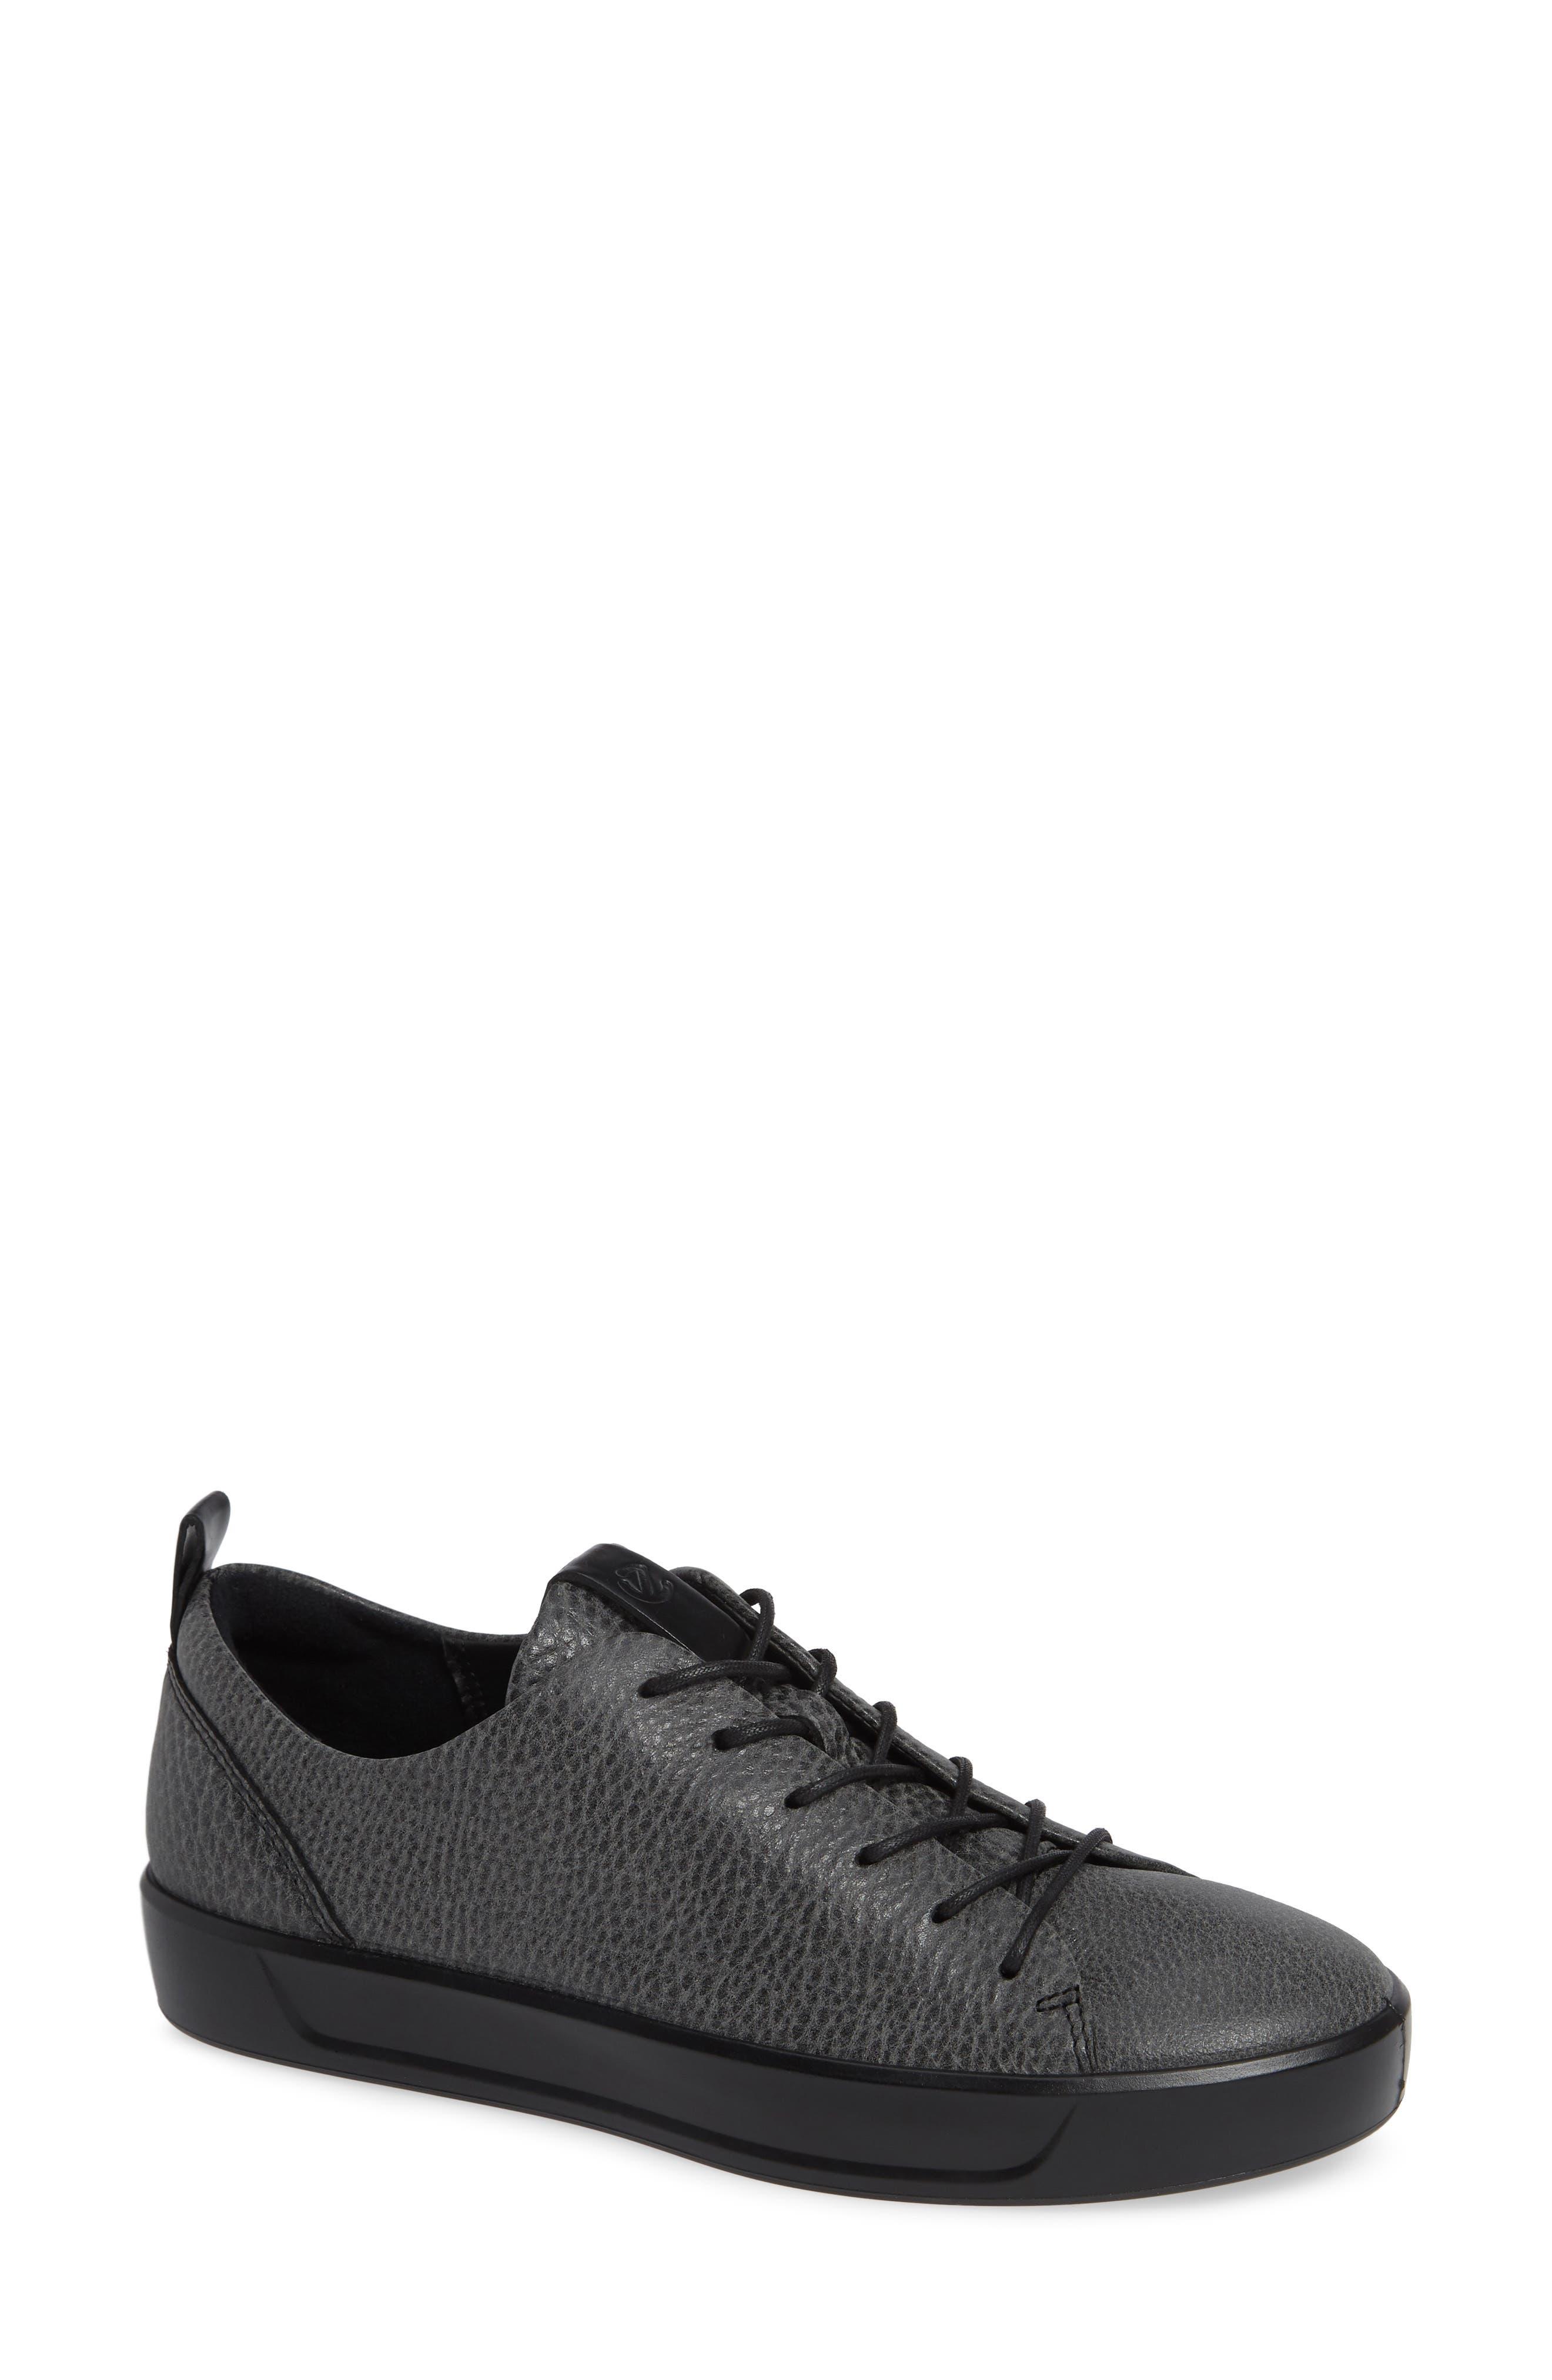 Soft 8 Sneaker,                             Main thumbnail 1, color,                             BLACK/ BLACK LEATHER